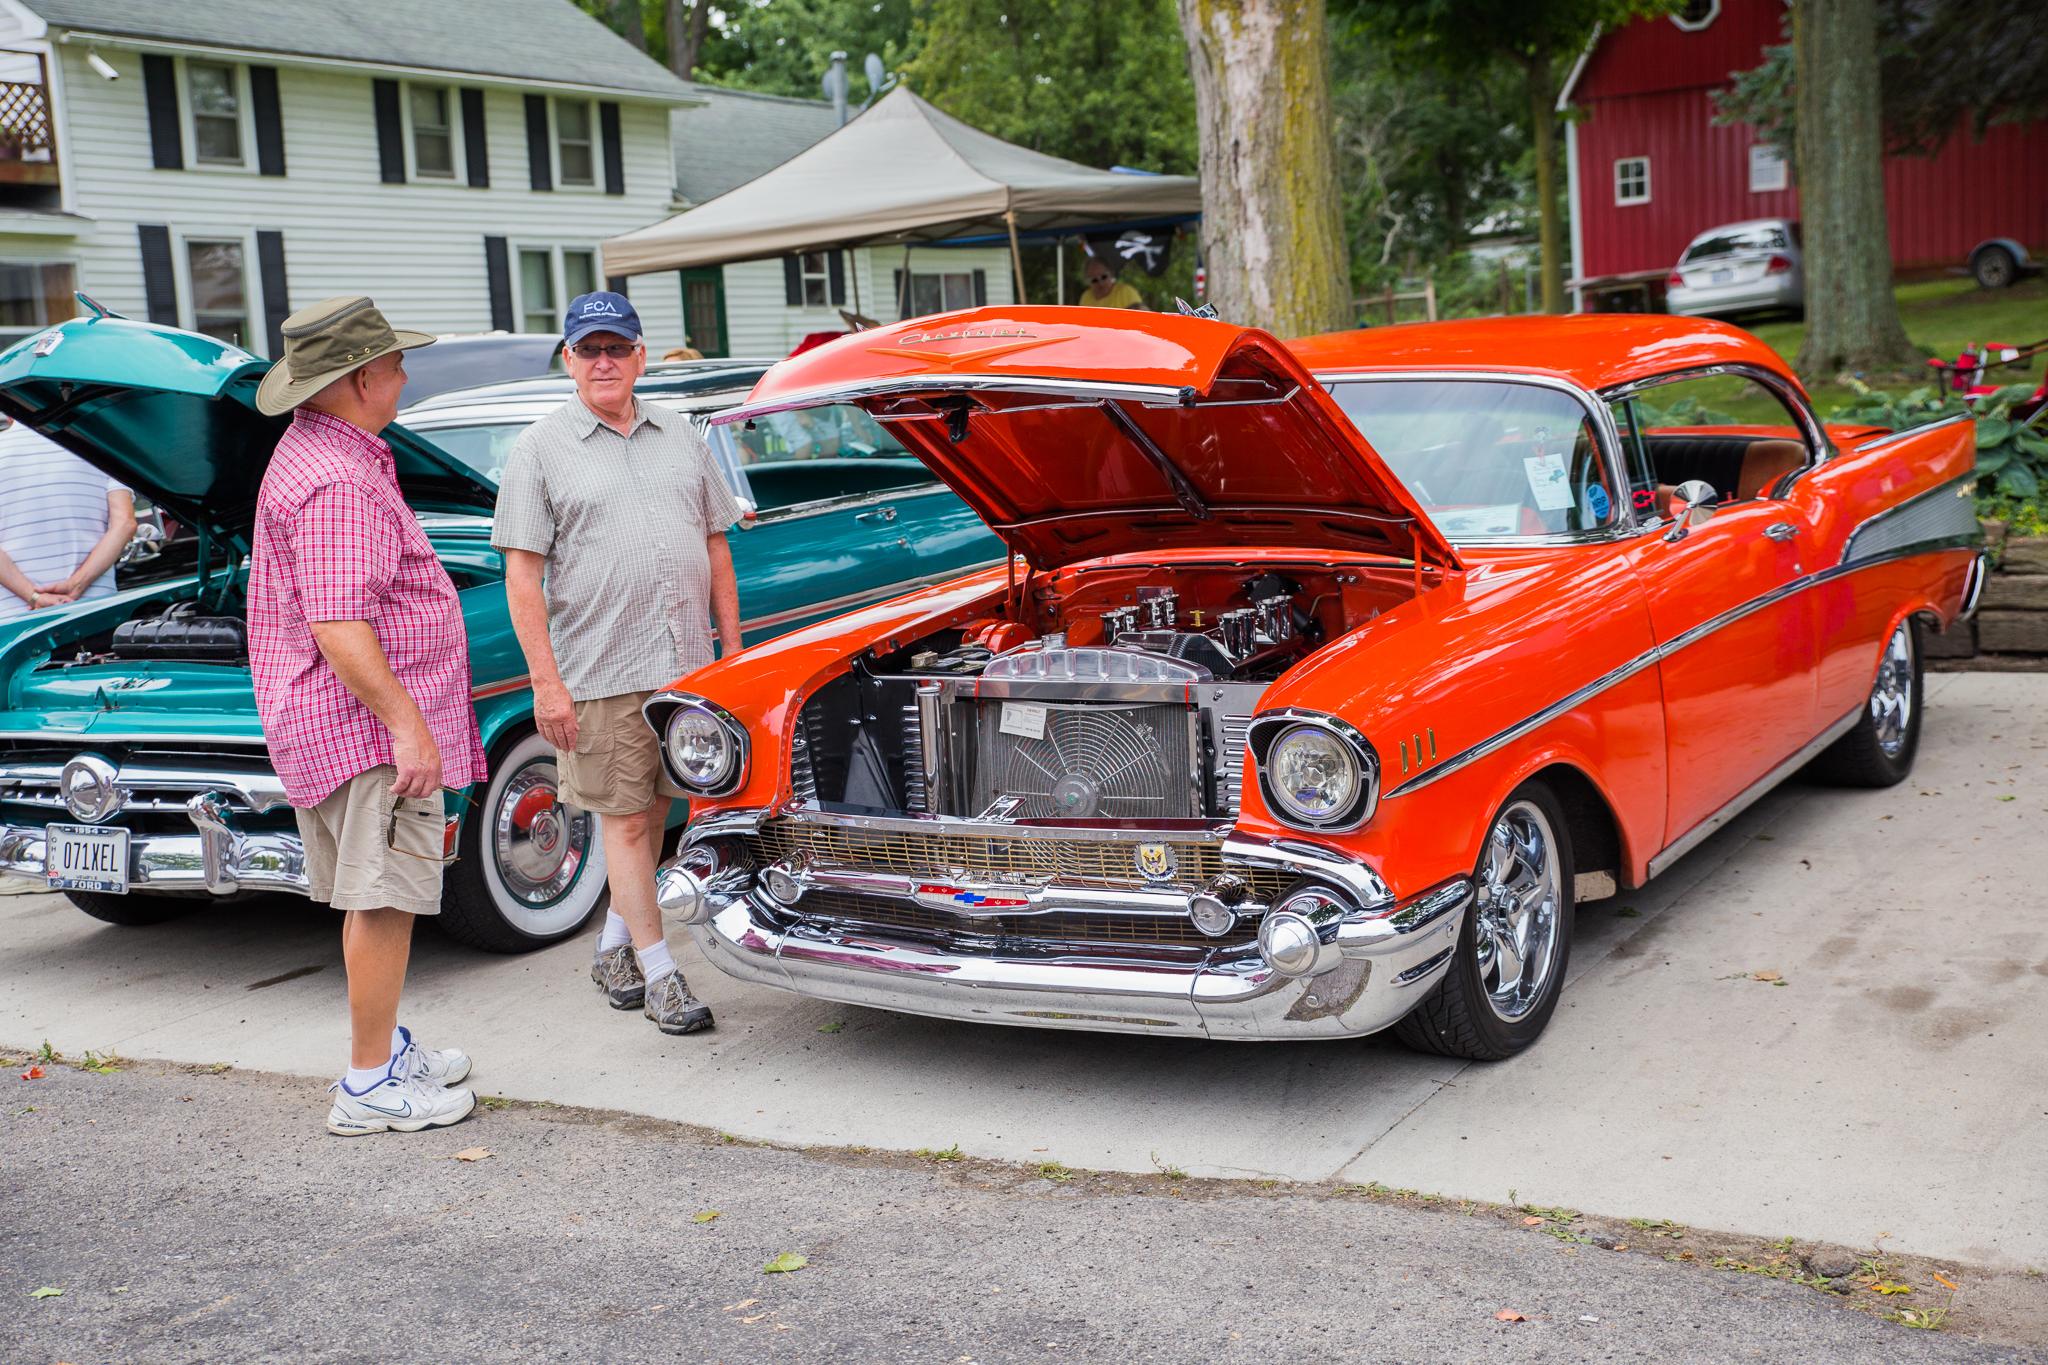 Devils lake car show autos post for Marketplace motors inc devils lake nd